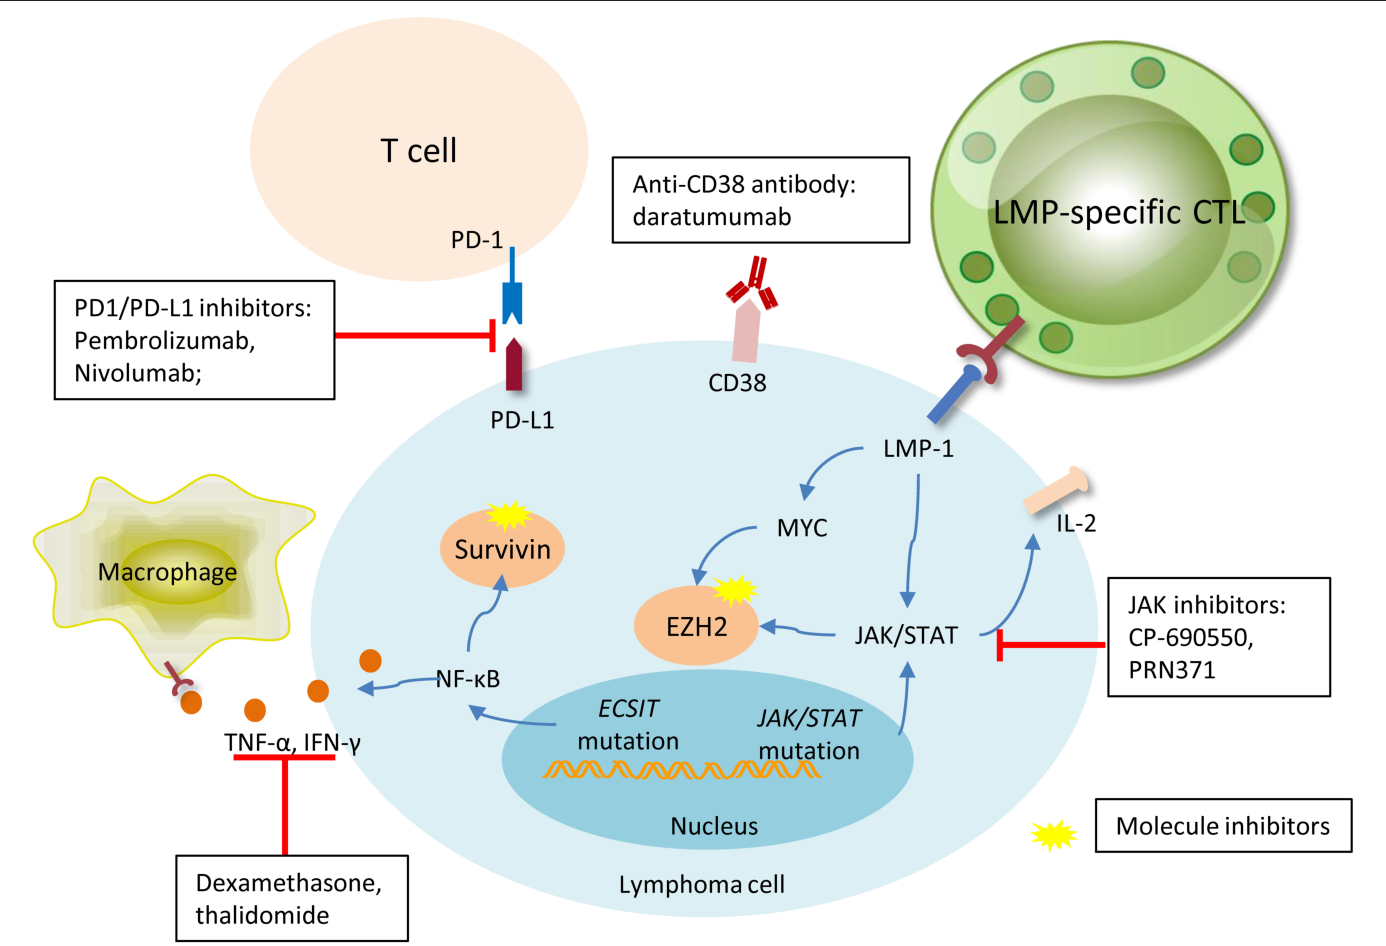 PDF] Epstein-Barr Virus-Positive Natural Killer/T-Cell Lymphoma